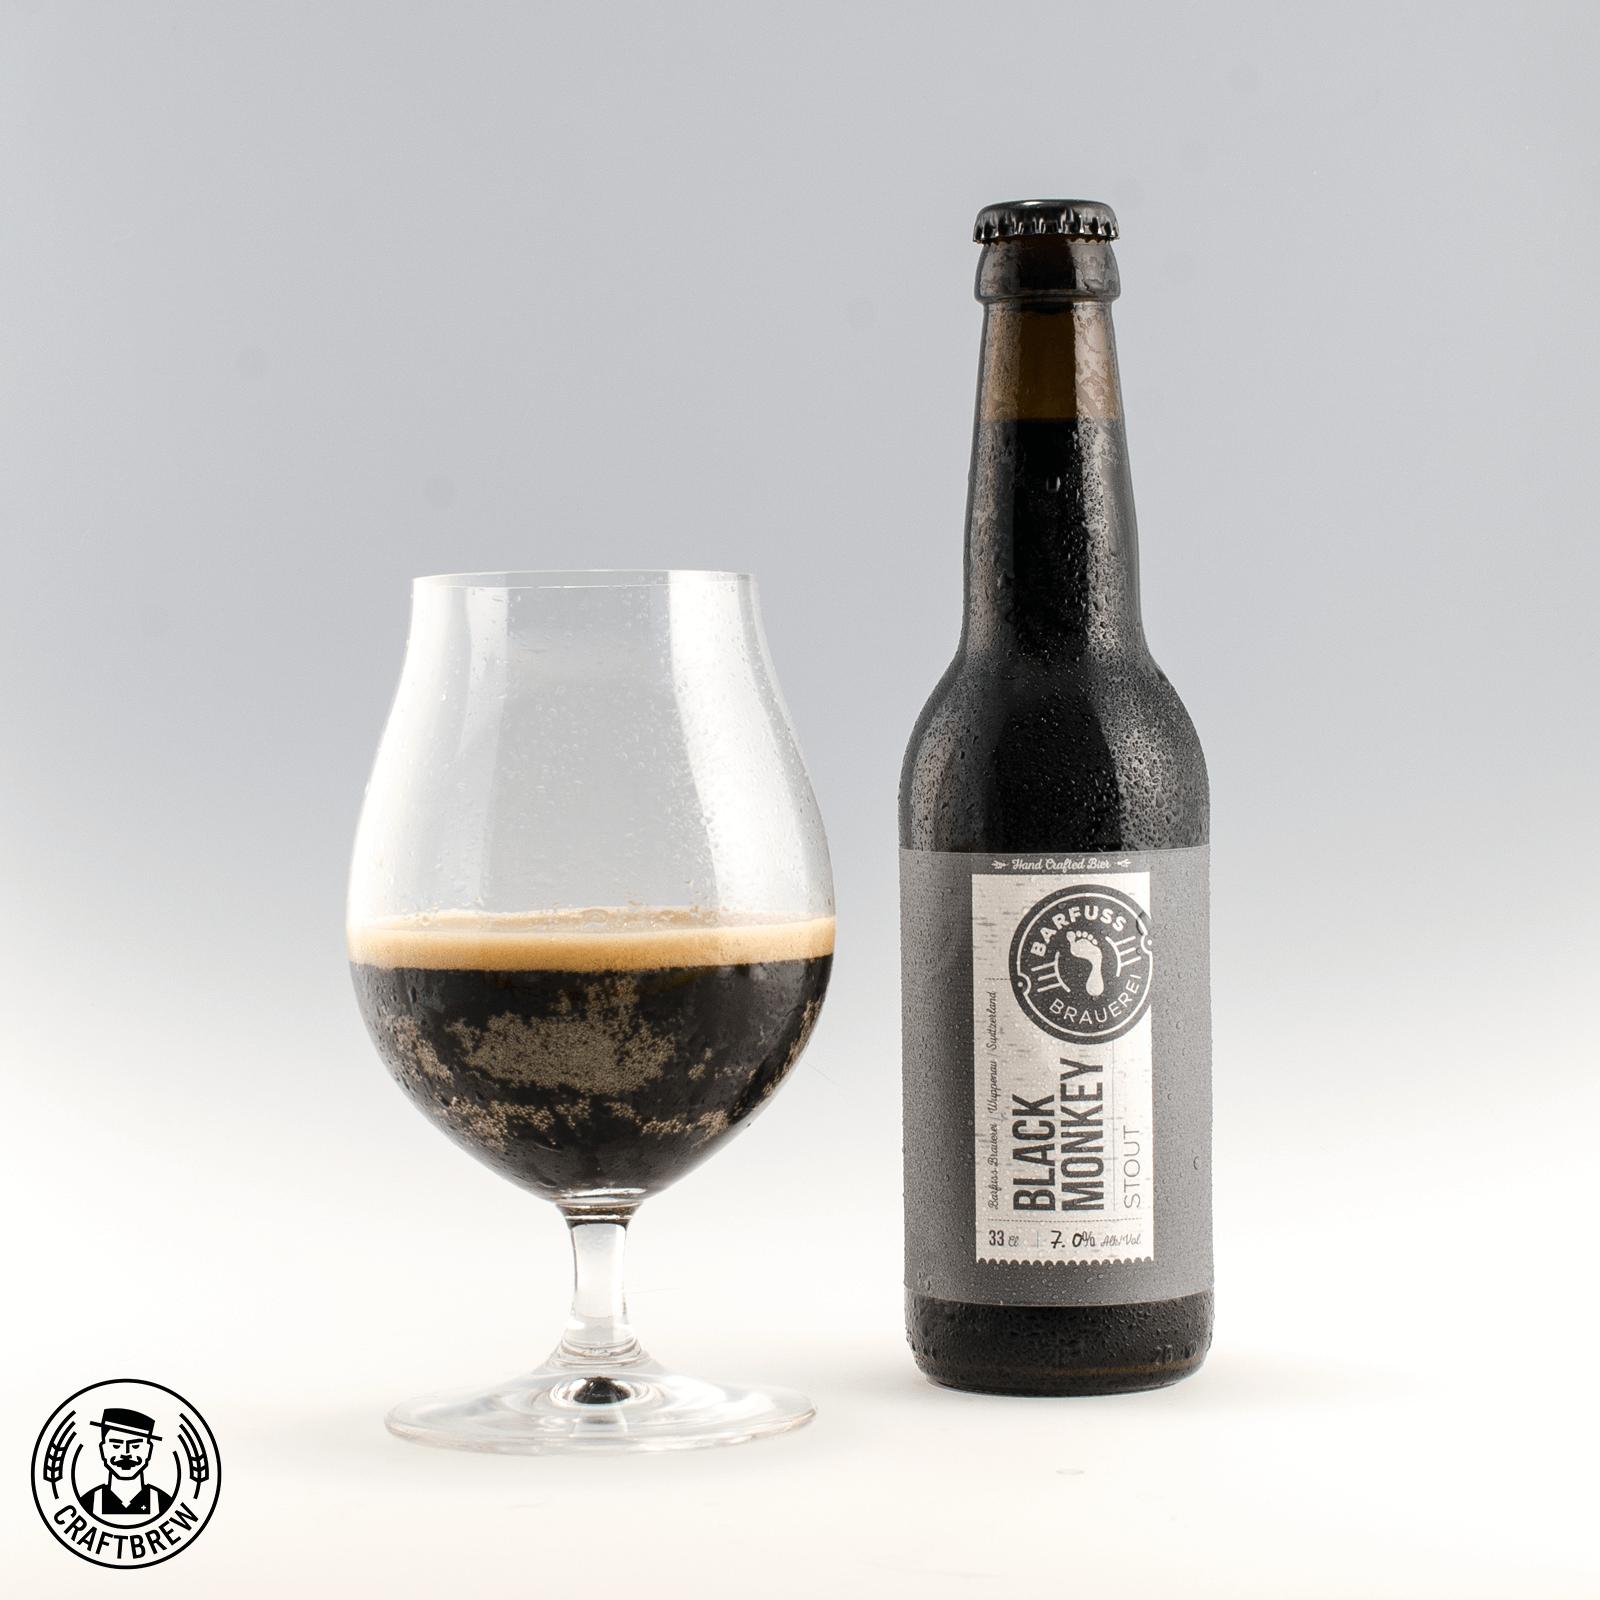 Black Monkey - Barfuss Brauerei